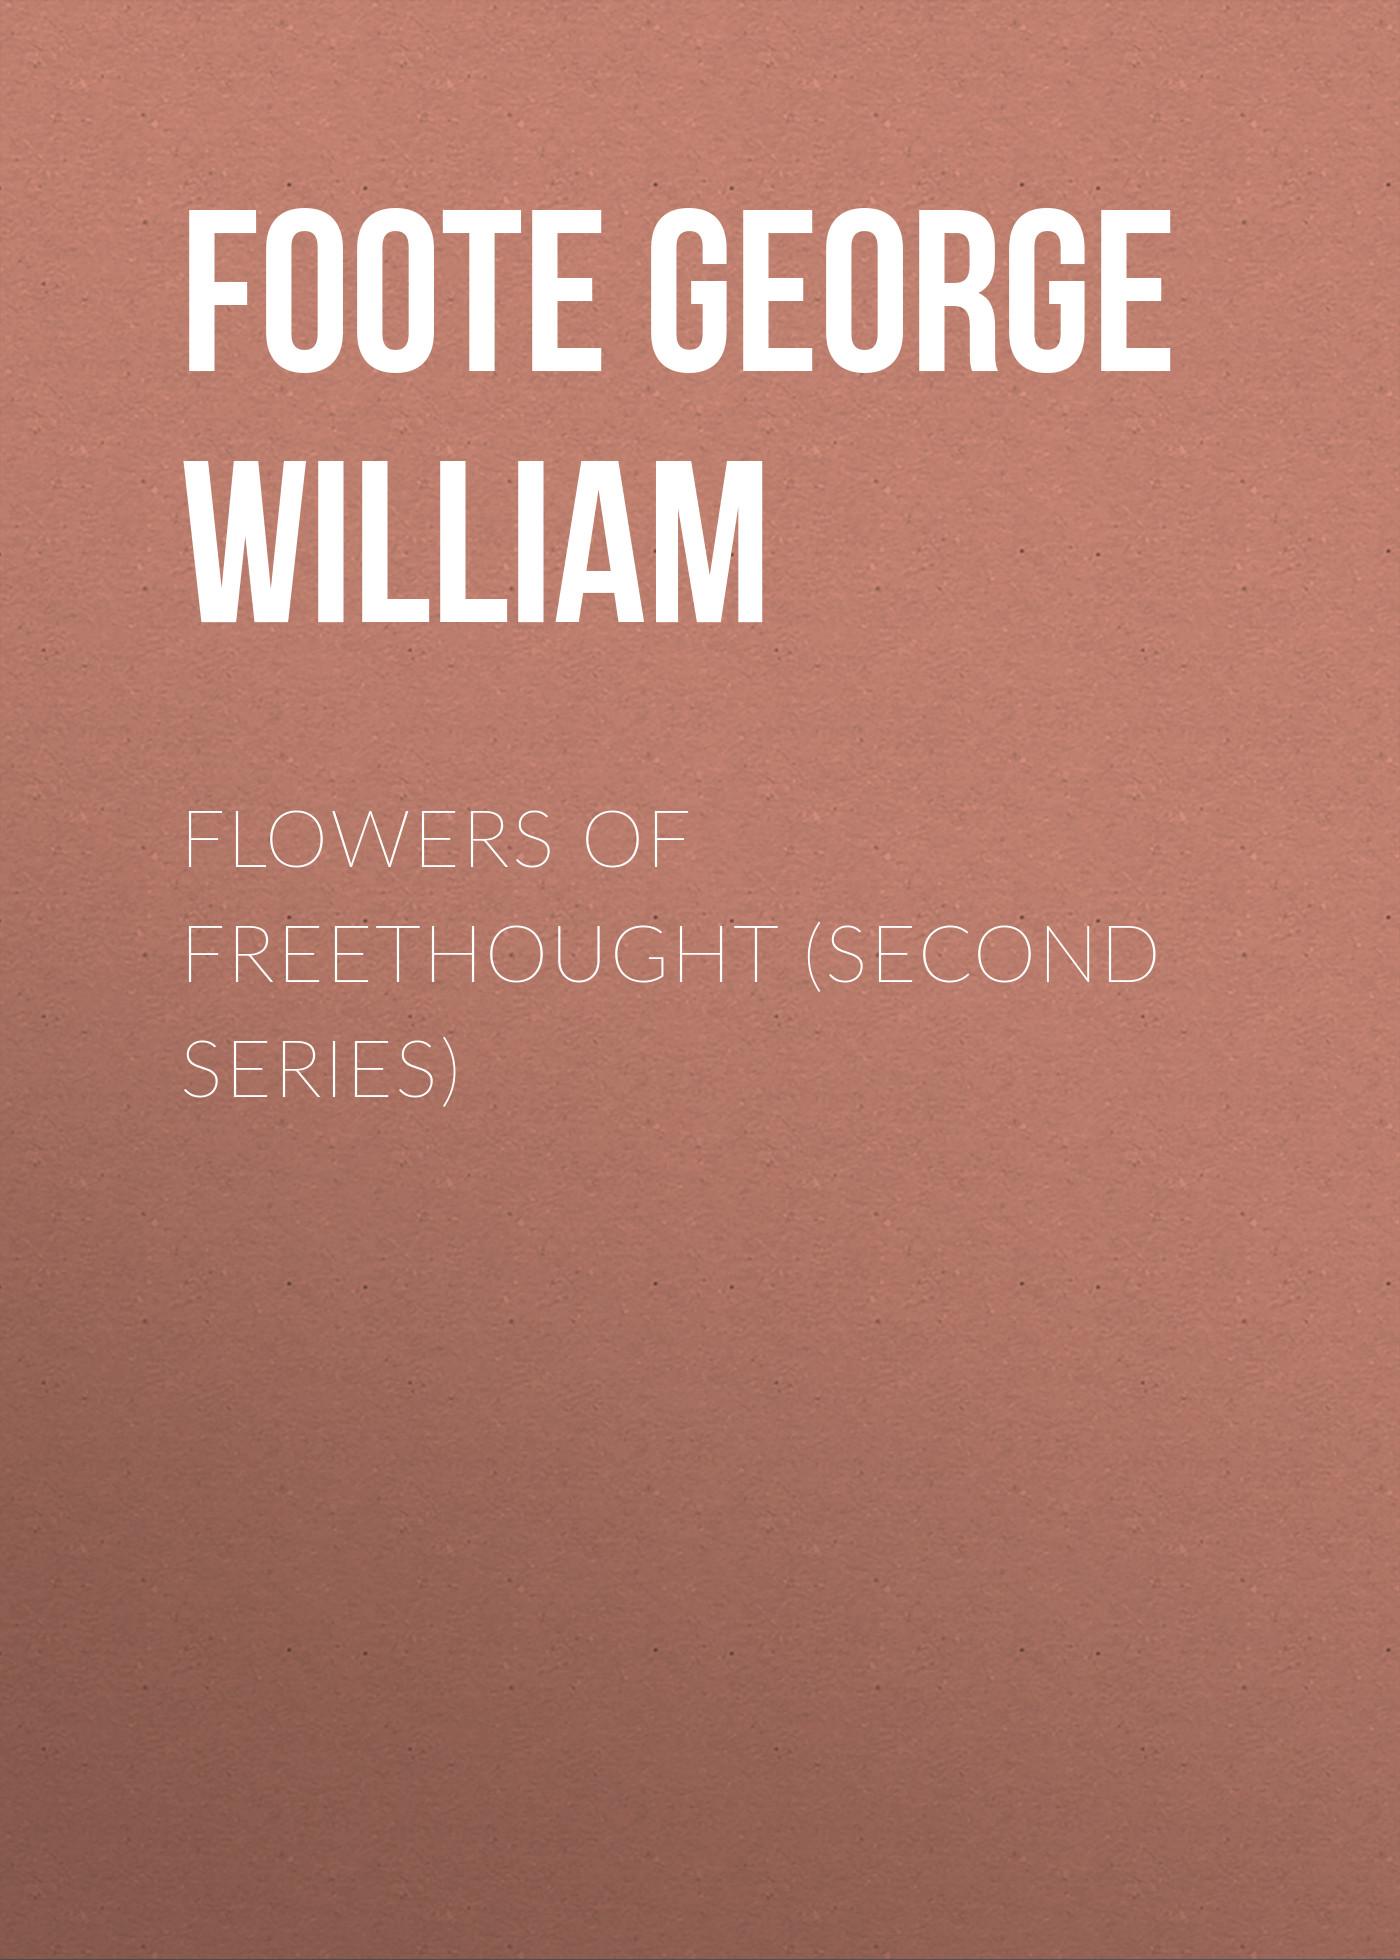 Foote George William Flowers of Freethought (Second Series) foote george william reminiscences of charles bradlaugh